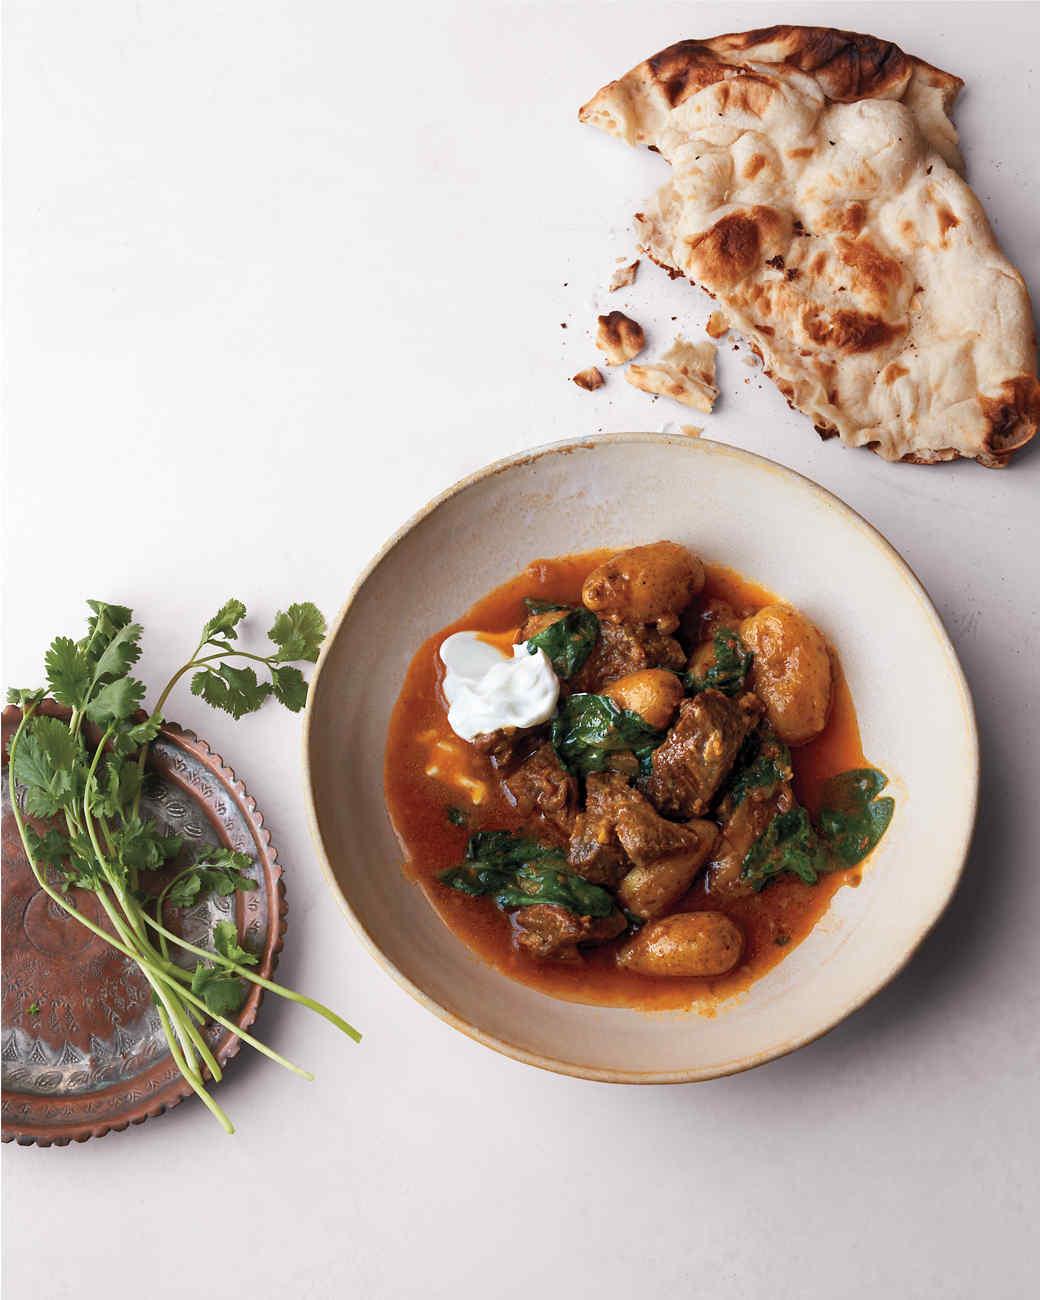 lamb-curry-in-pressure-cooker-020-d111131.jpg